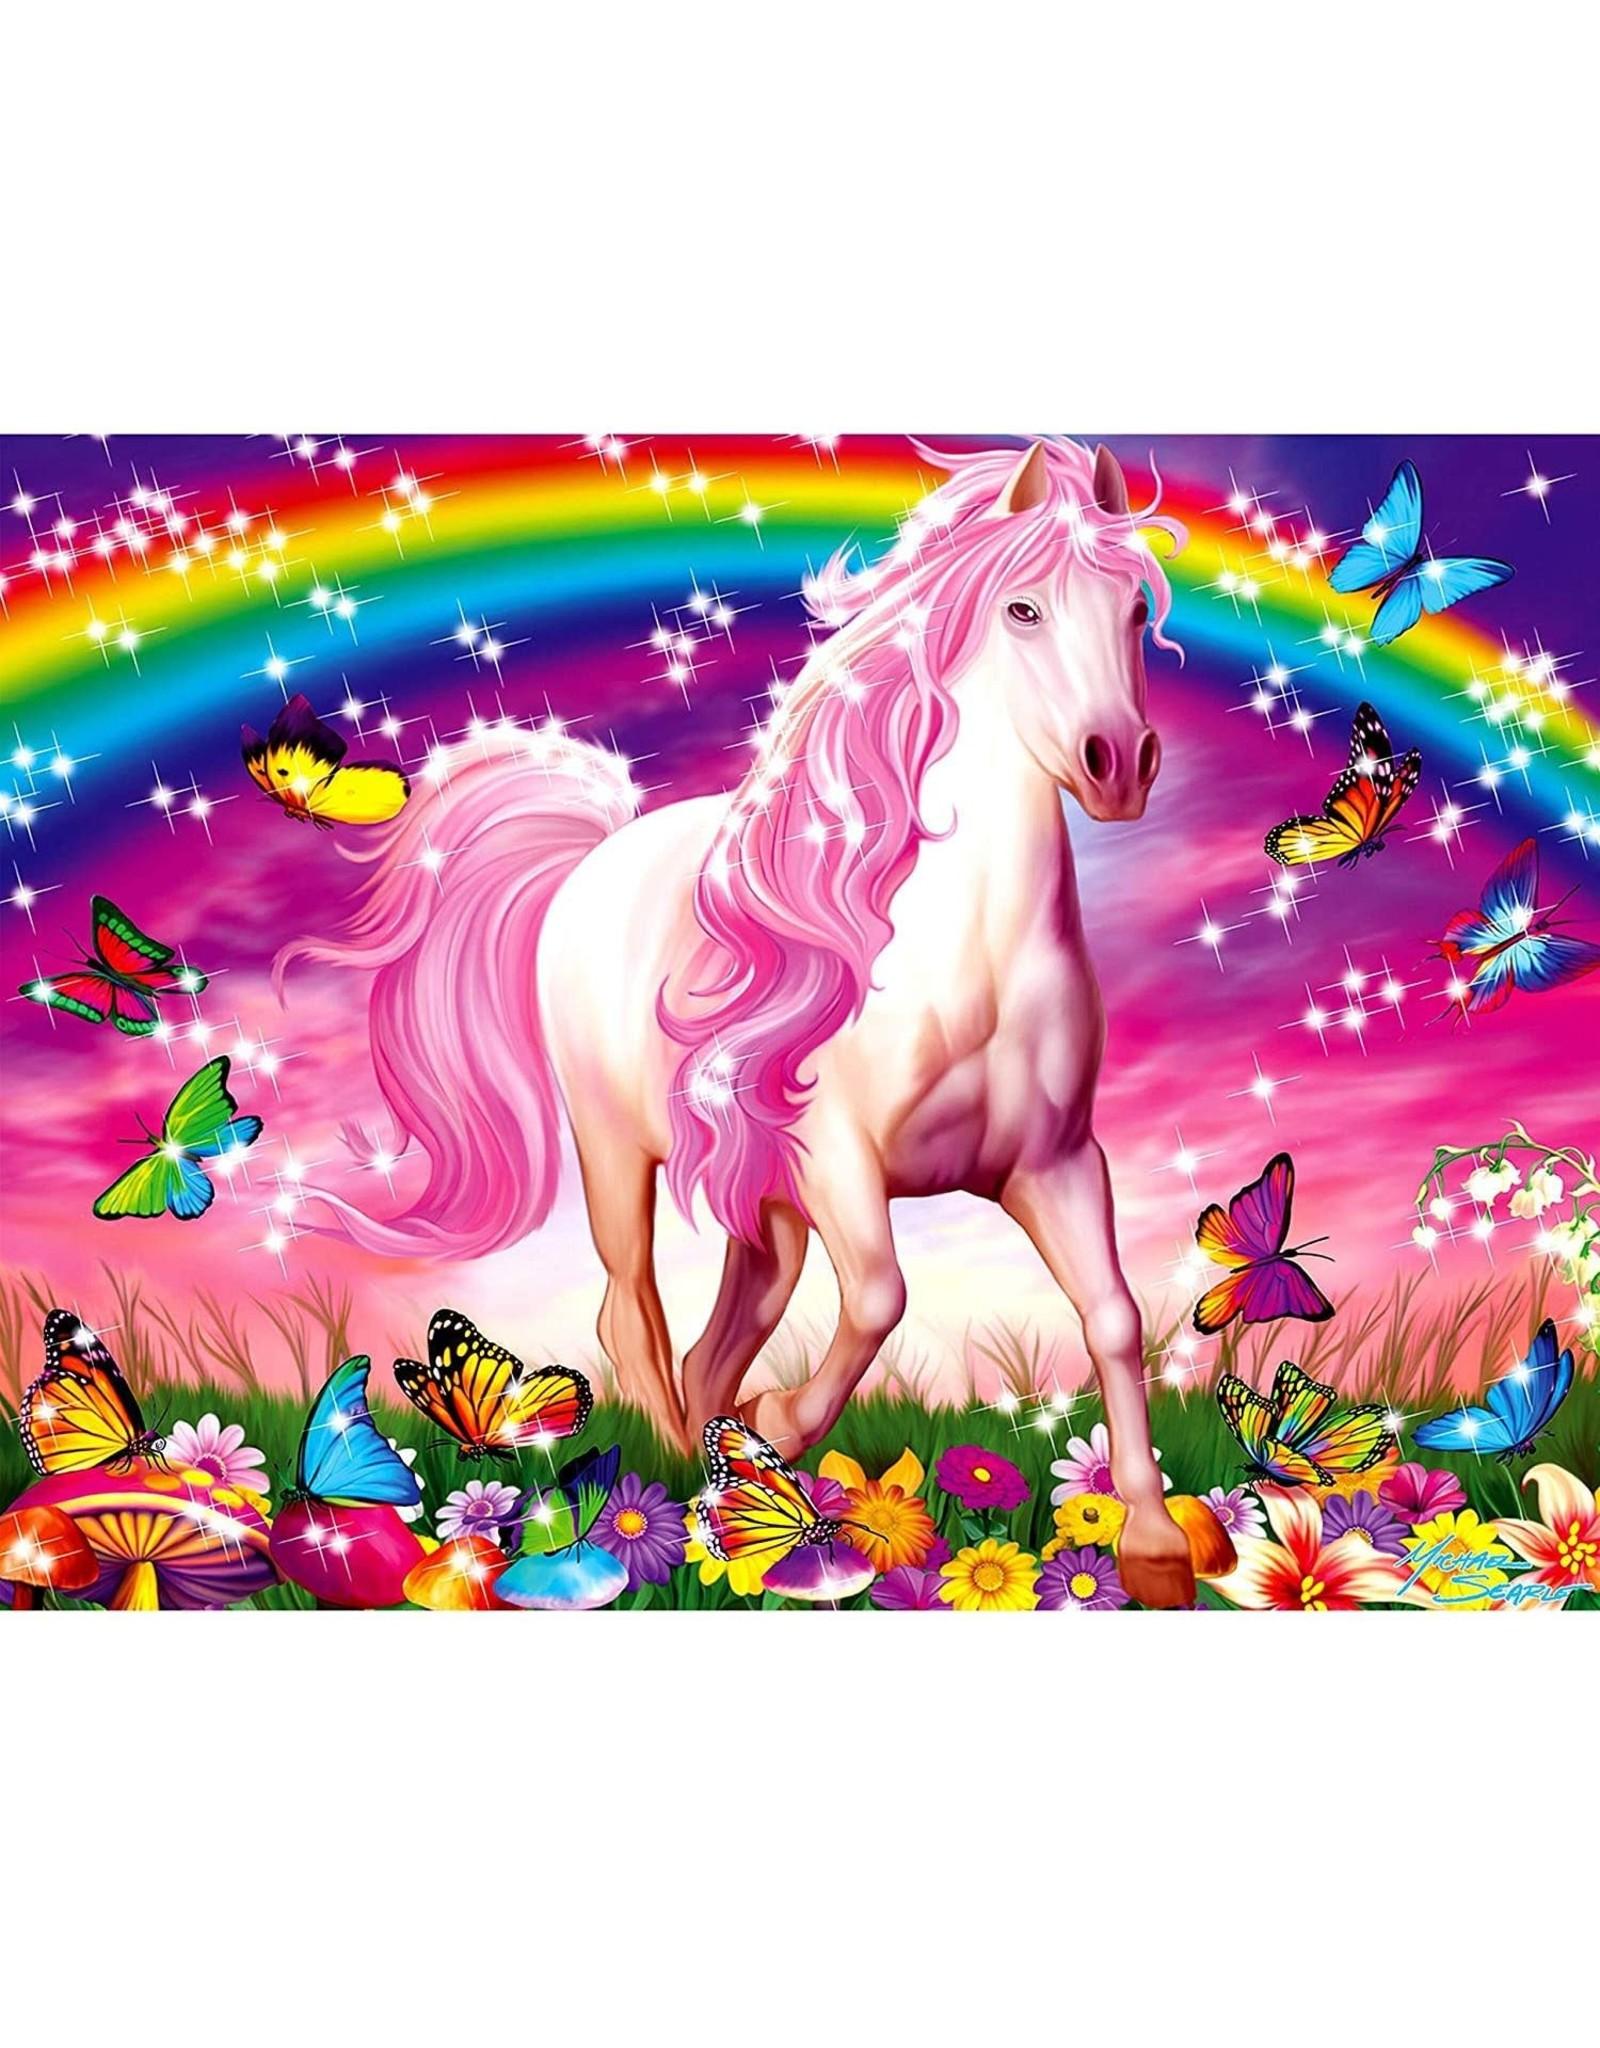 Ravensburger 100 pcs. Glitter Horse Dream  XXL Puzzle